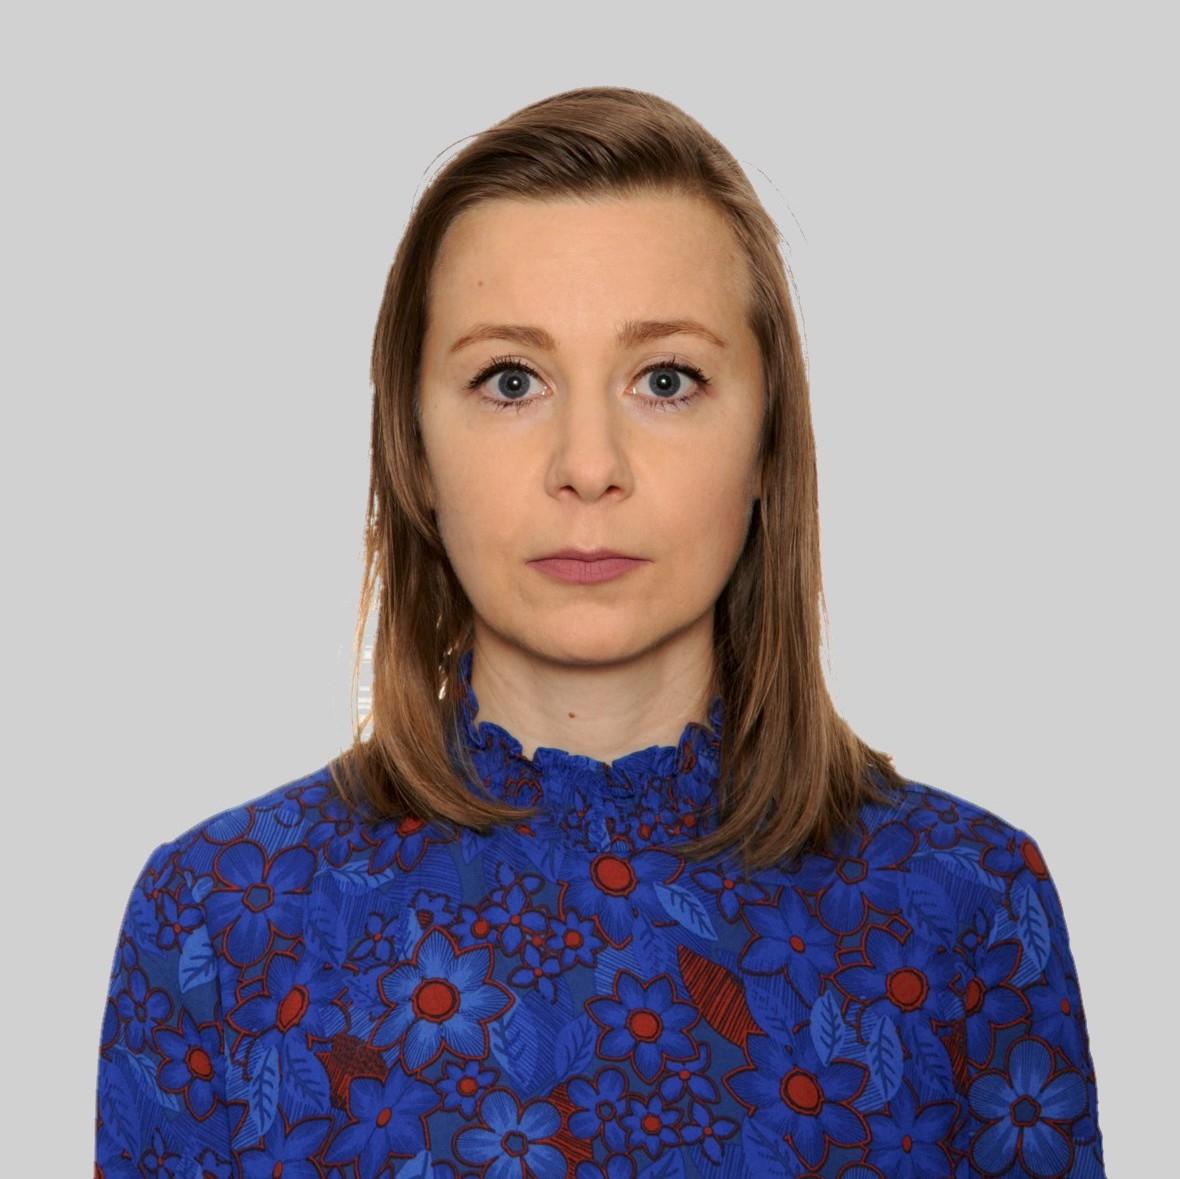 Фетисова Анастасия Александровна